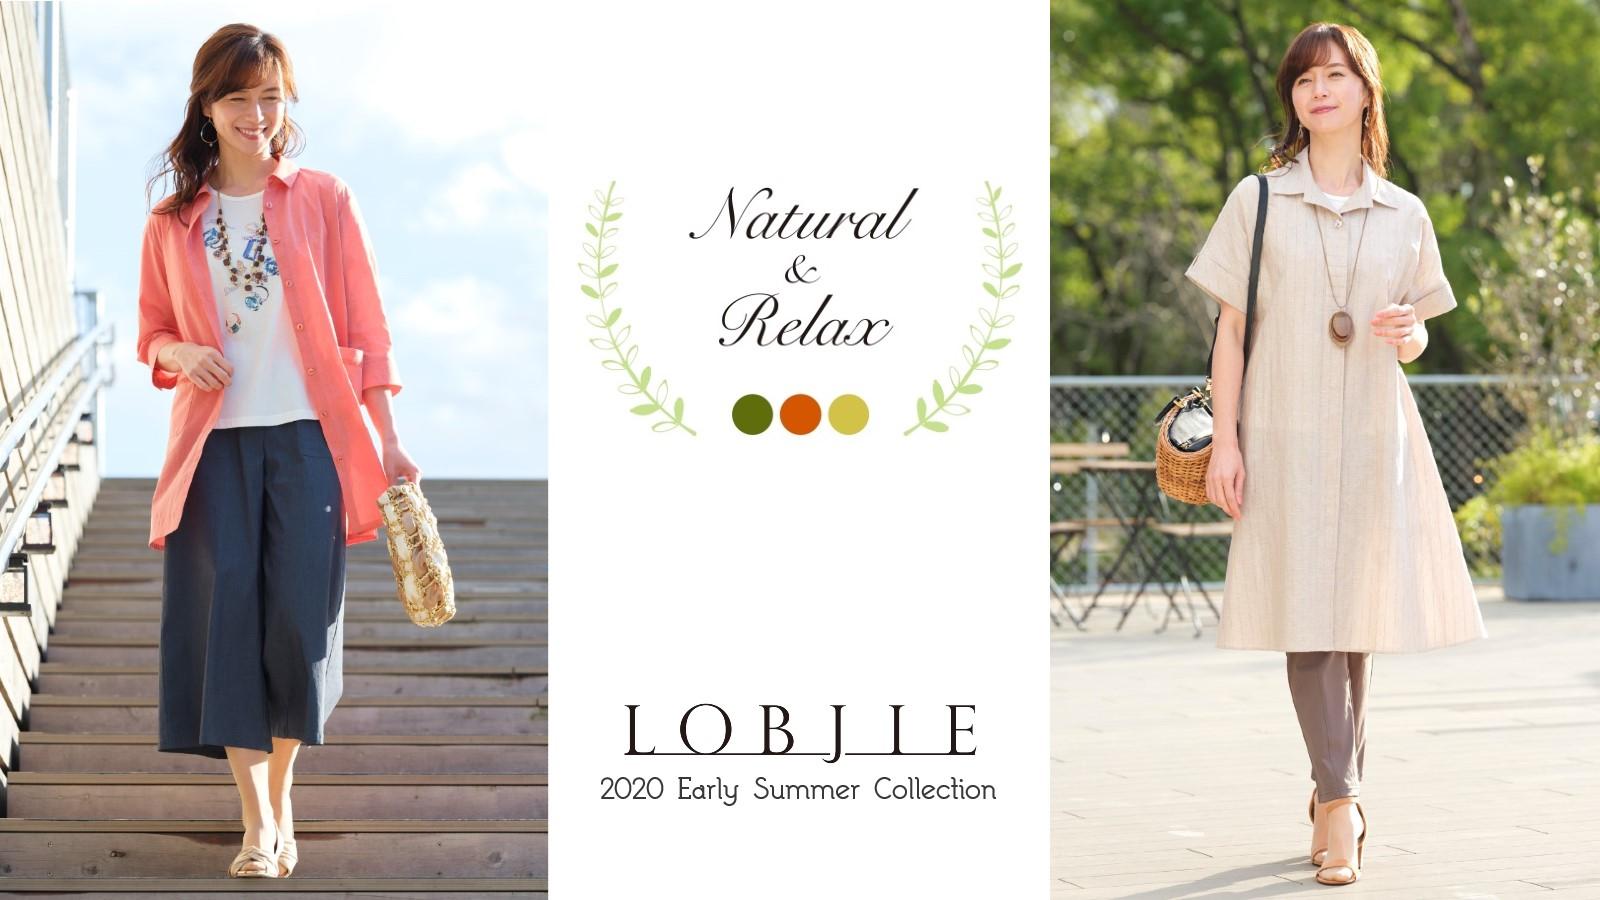 [LOBJIE] カタログ掲載の初夏商品が入荷致しました